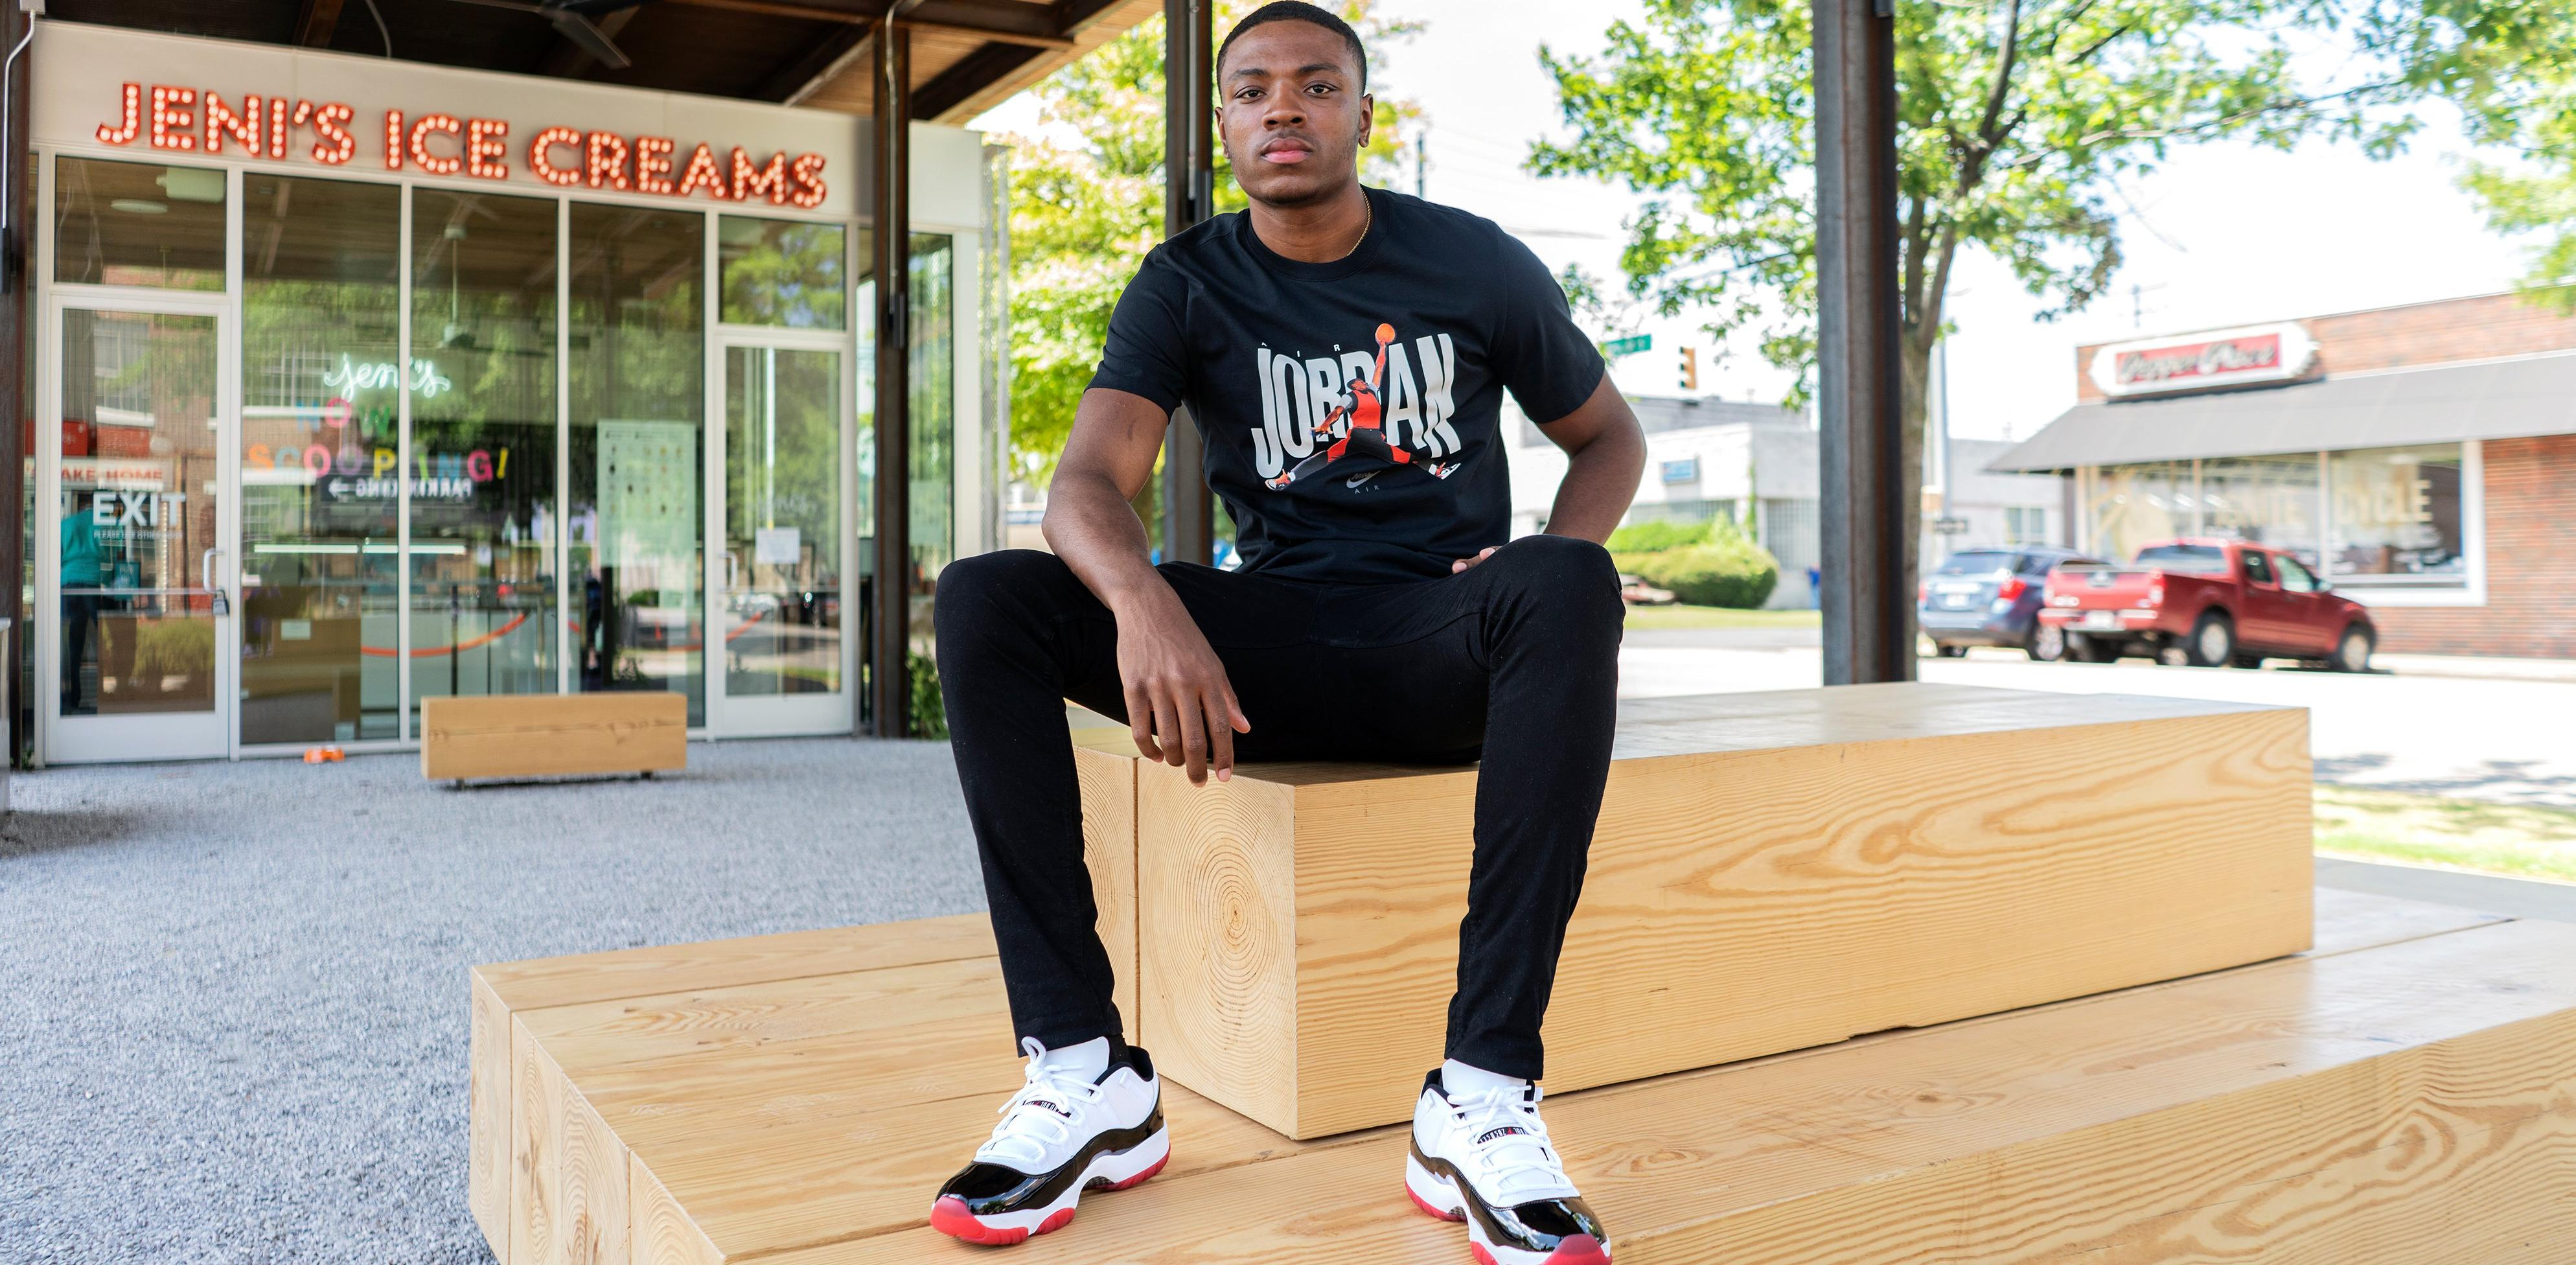 "Jordan 11 Retro Low ""White Bred"" White/University Red/Black Men's and Kids' Shoe"